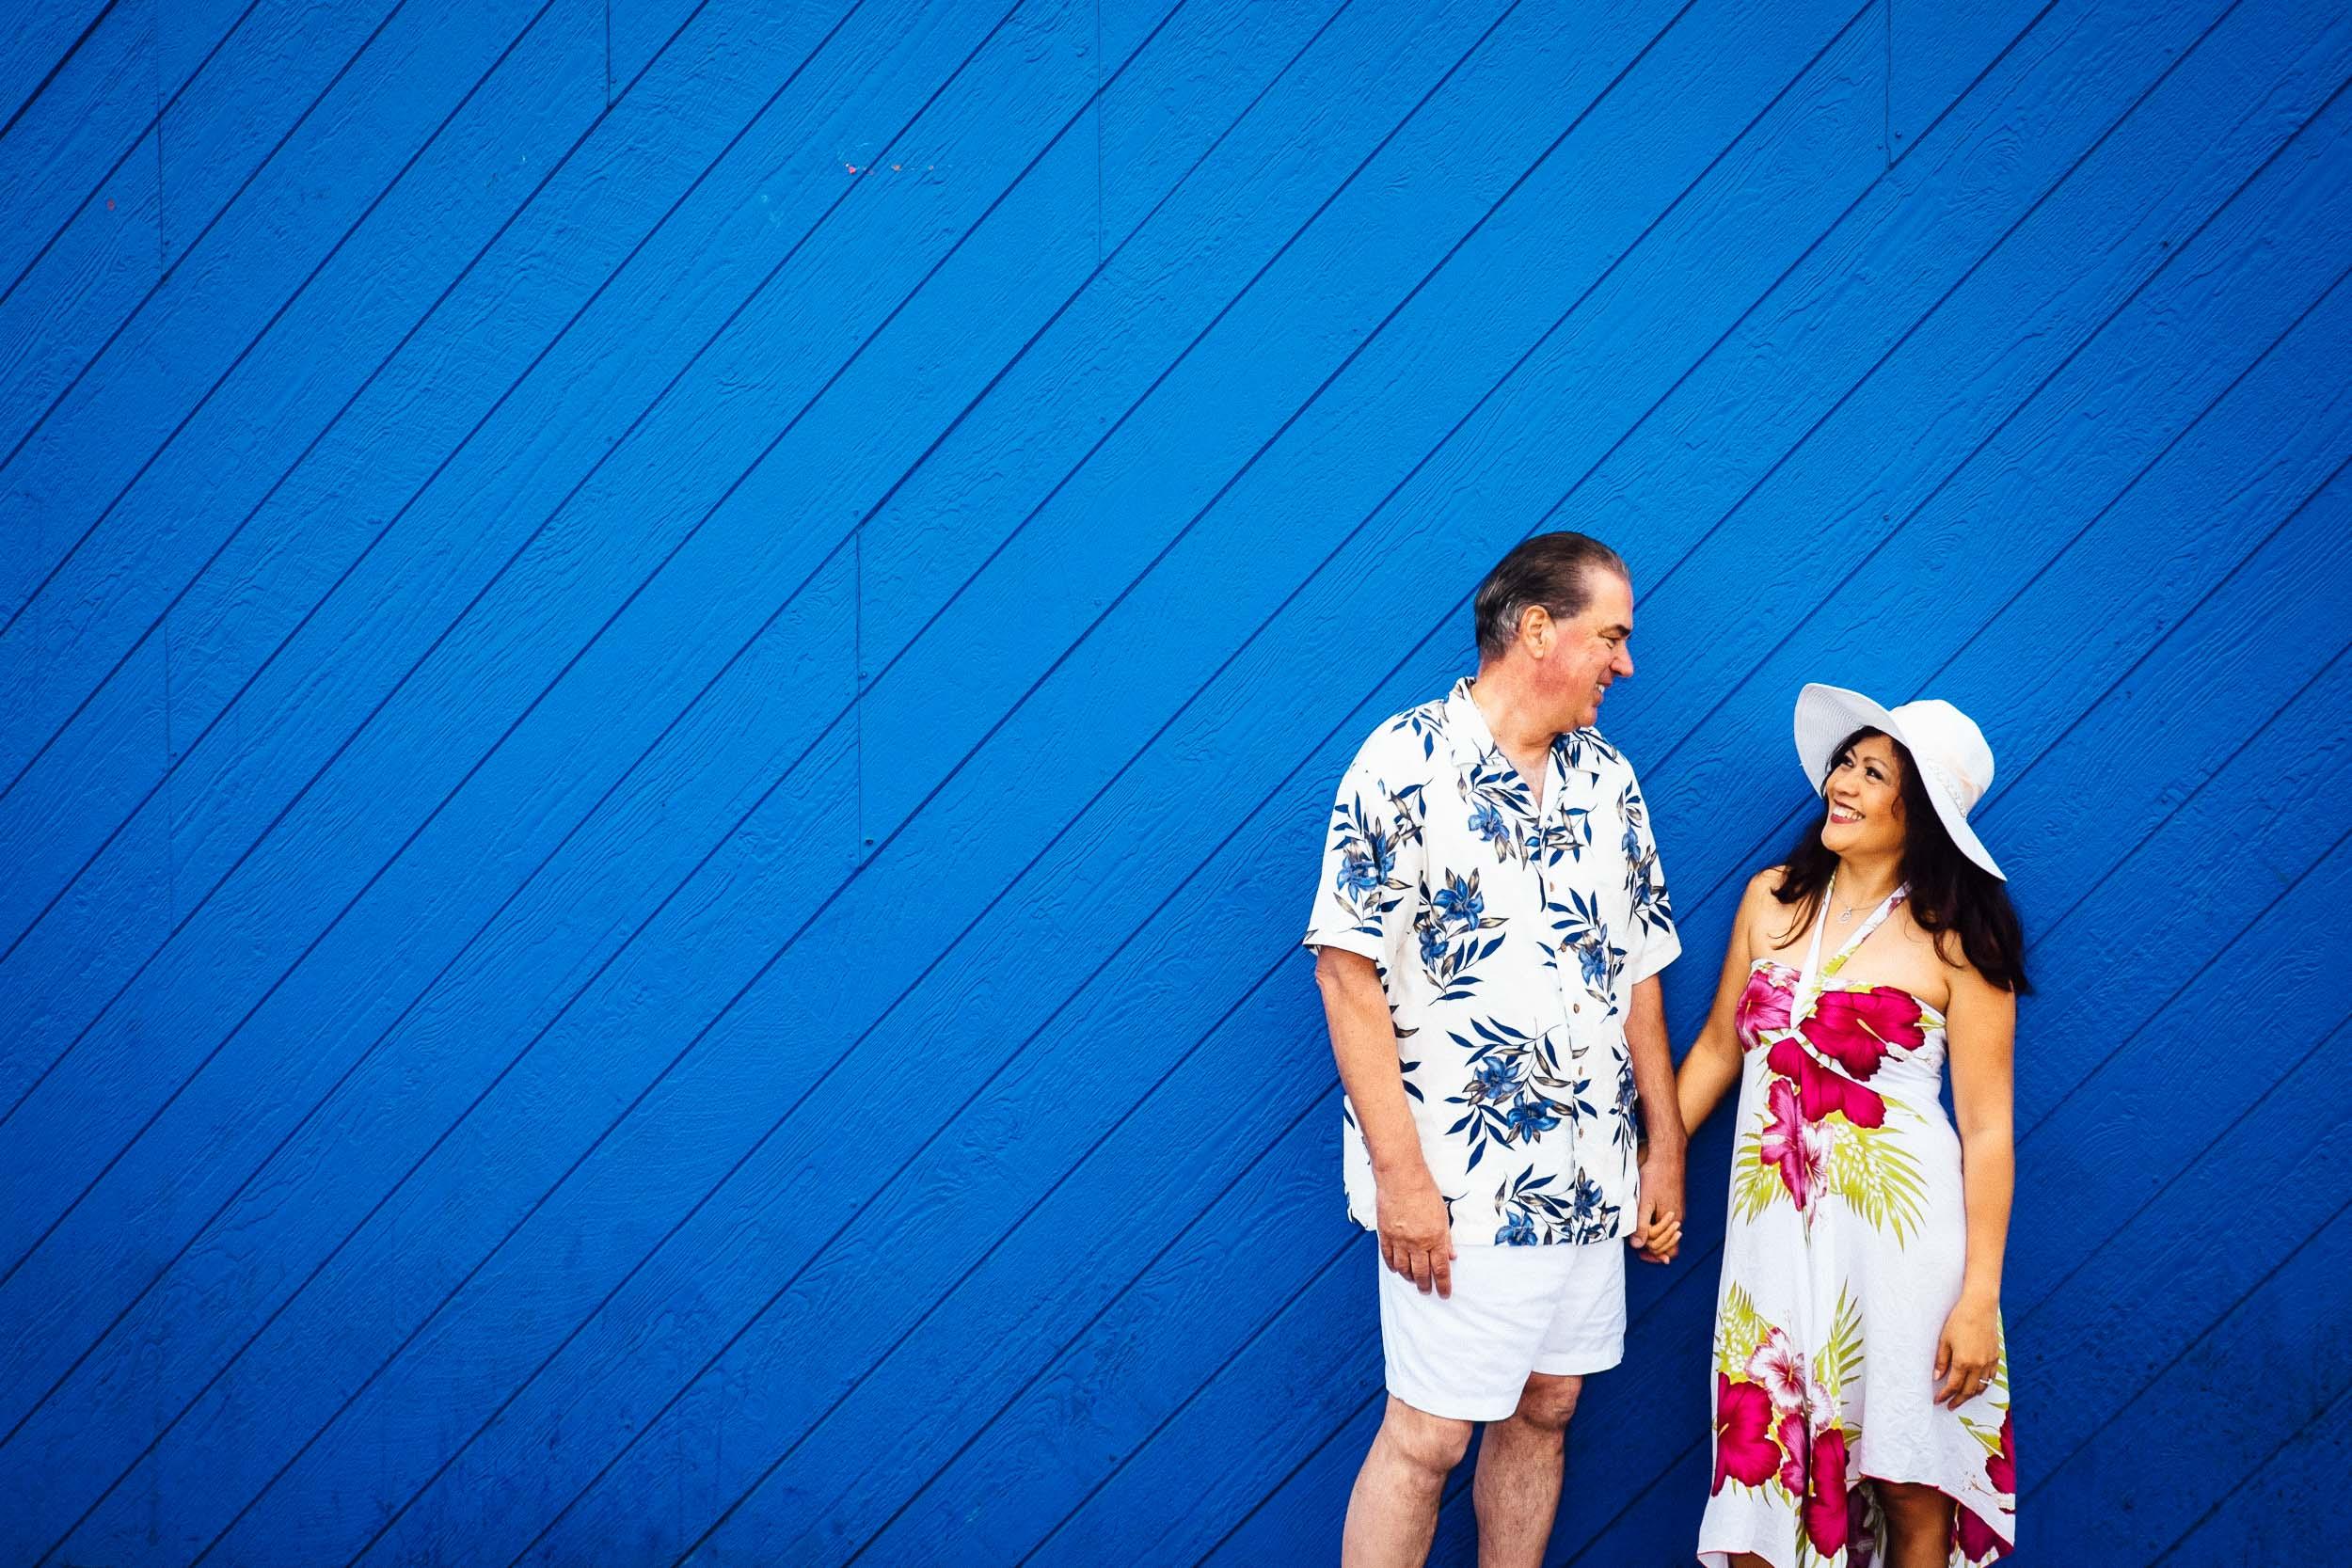 Bryan-Miraflor-Photography-Rose-Engagement-Photoshoot-20150613-0281.jpg